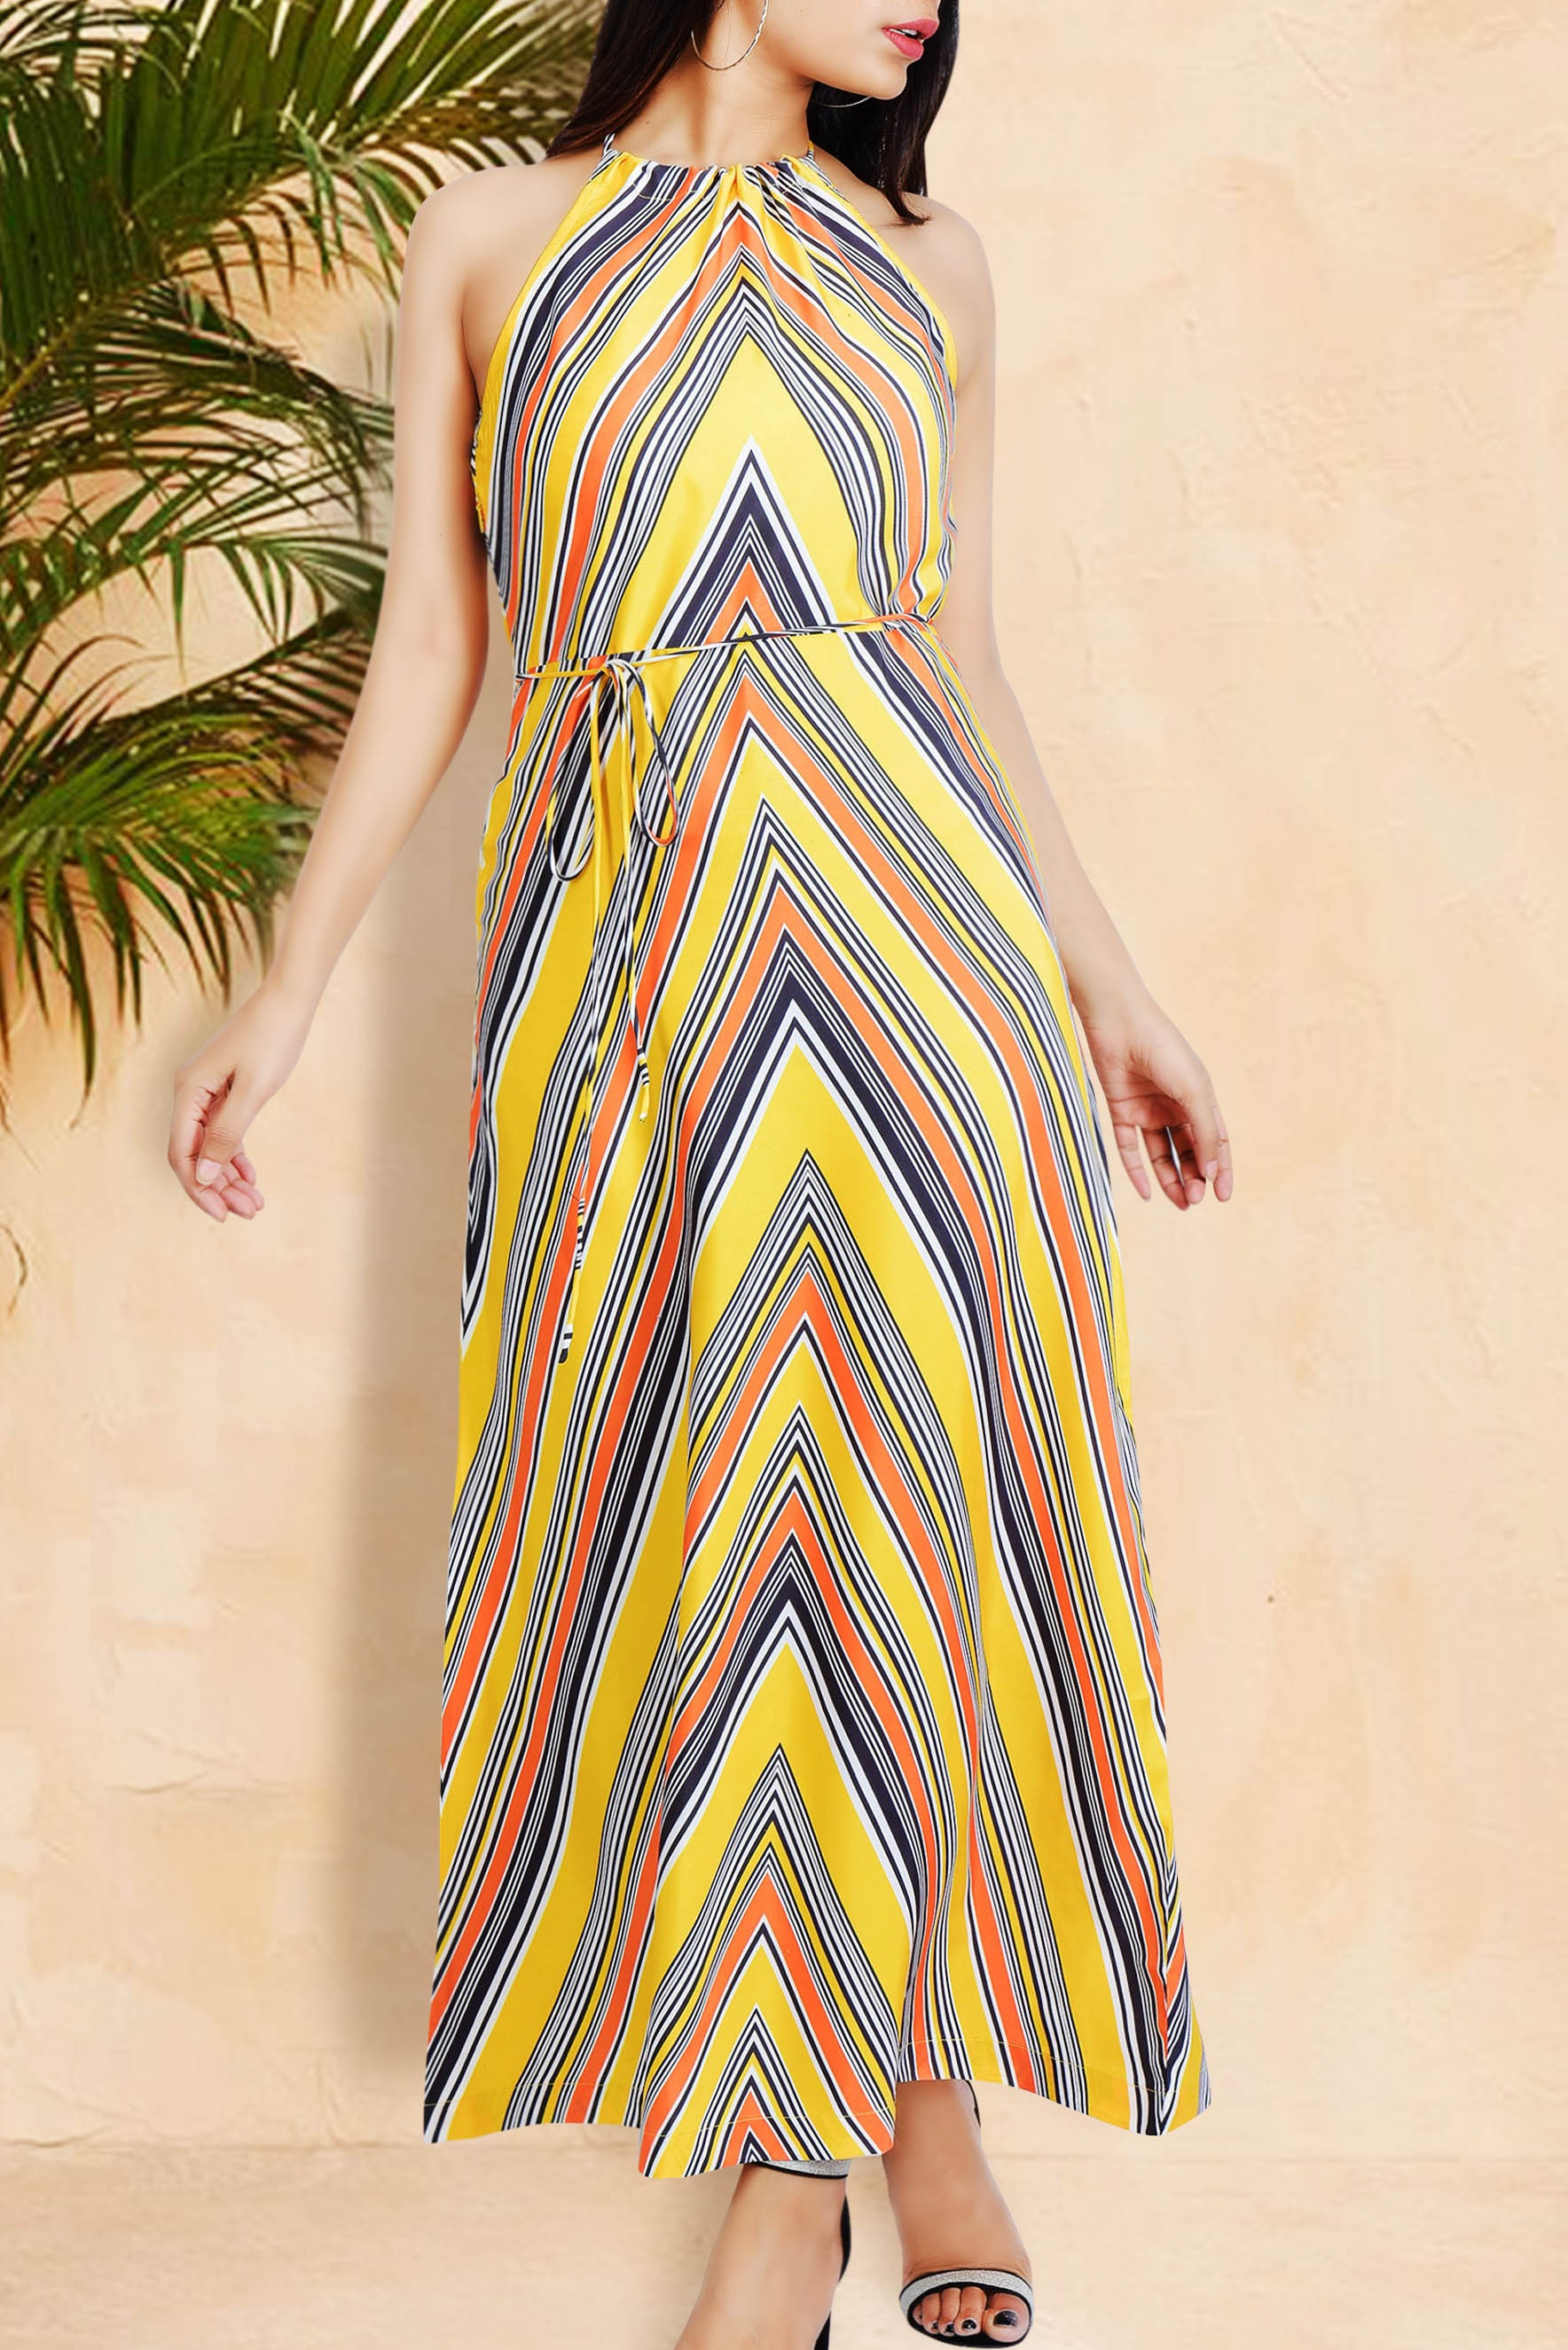 Pretty in Print Dress